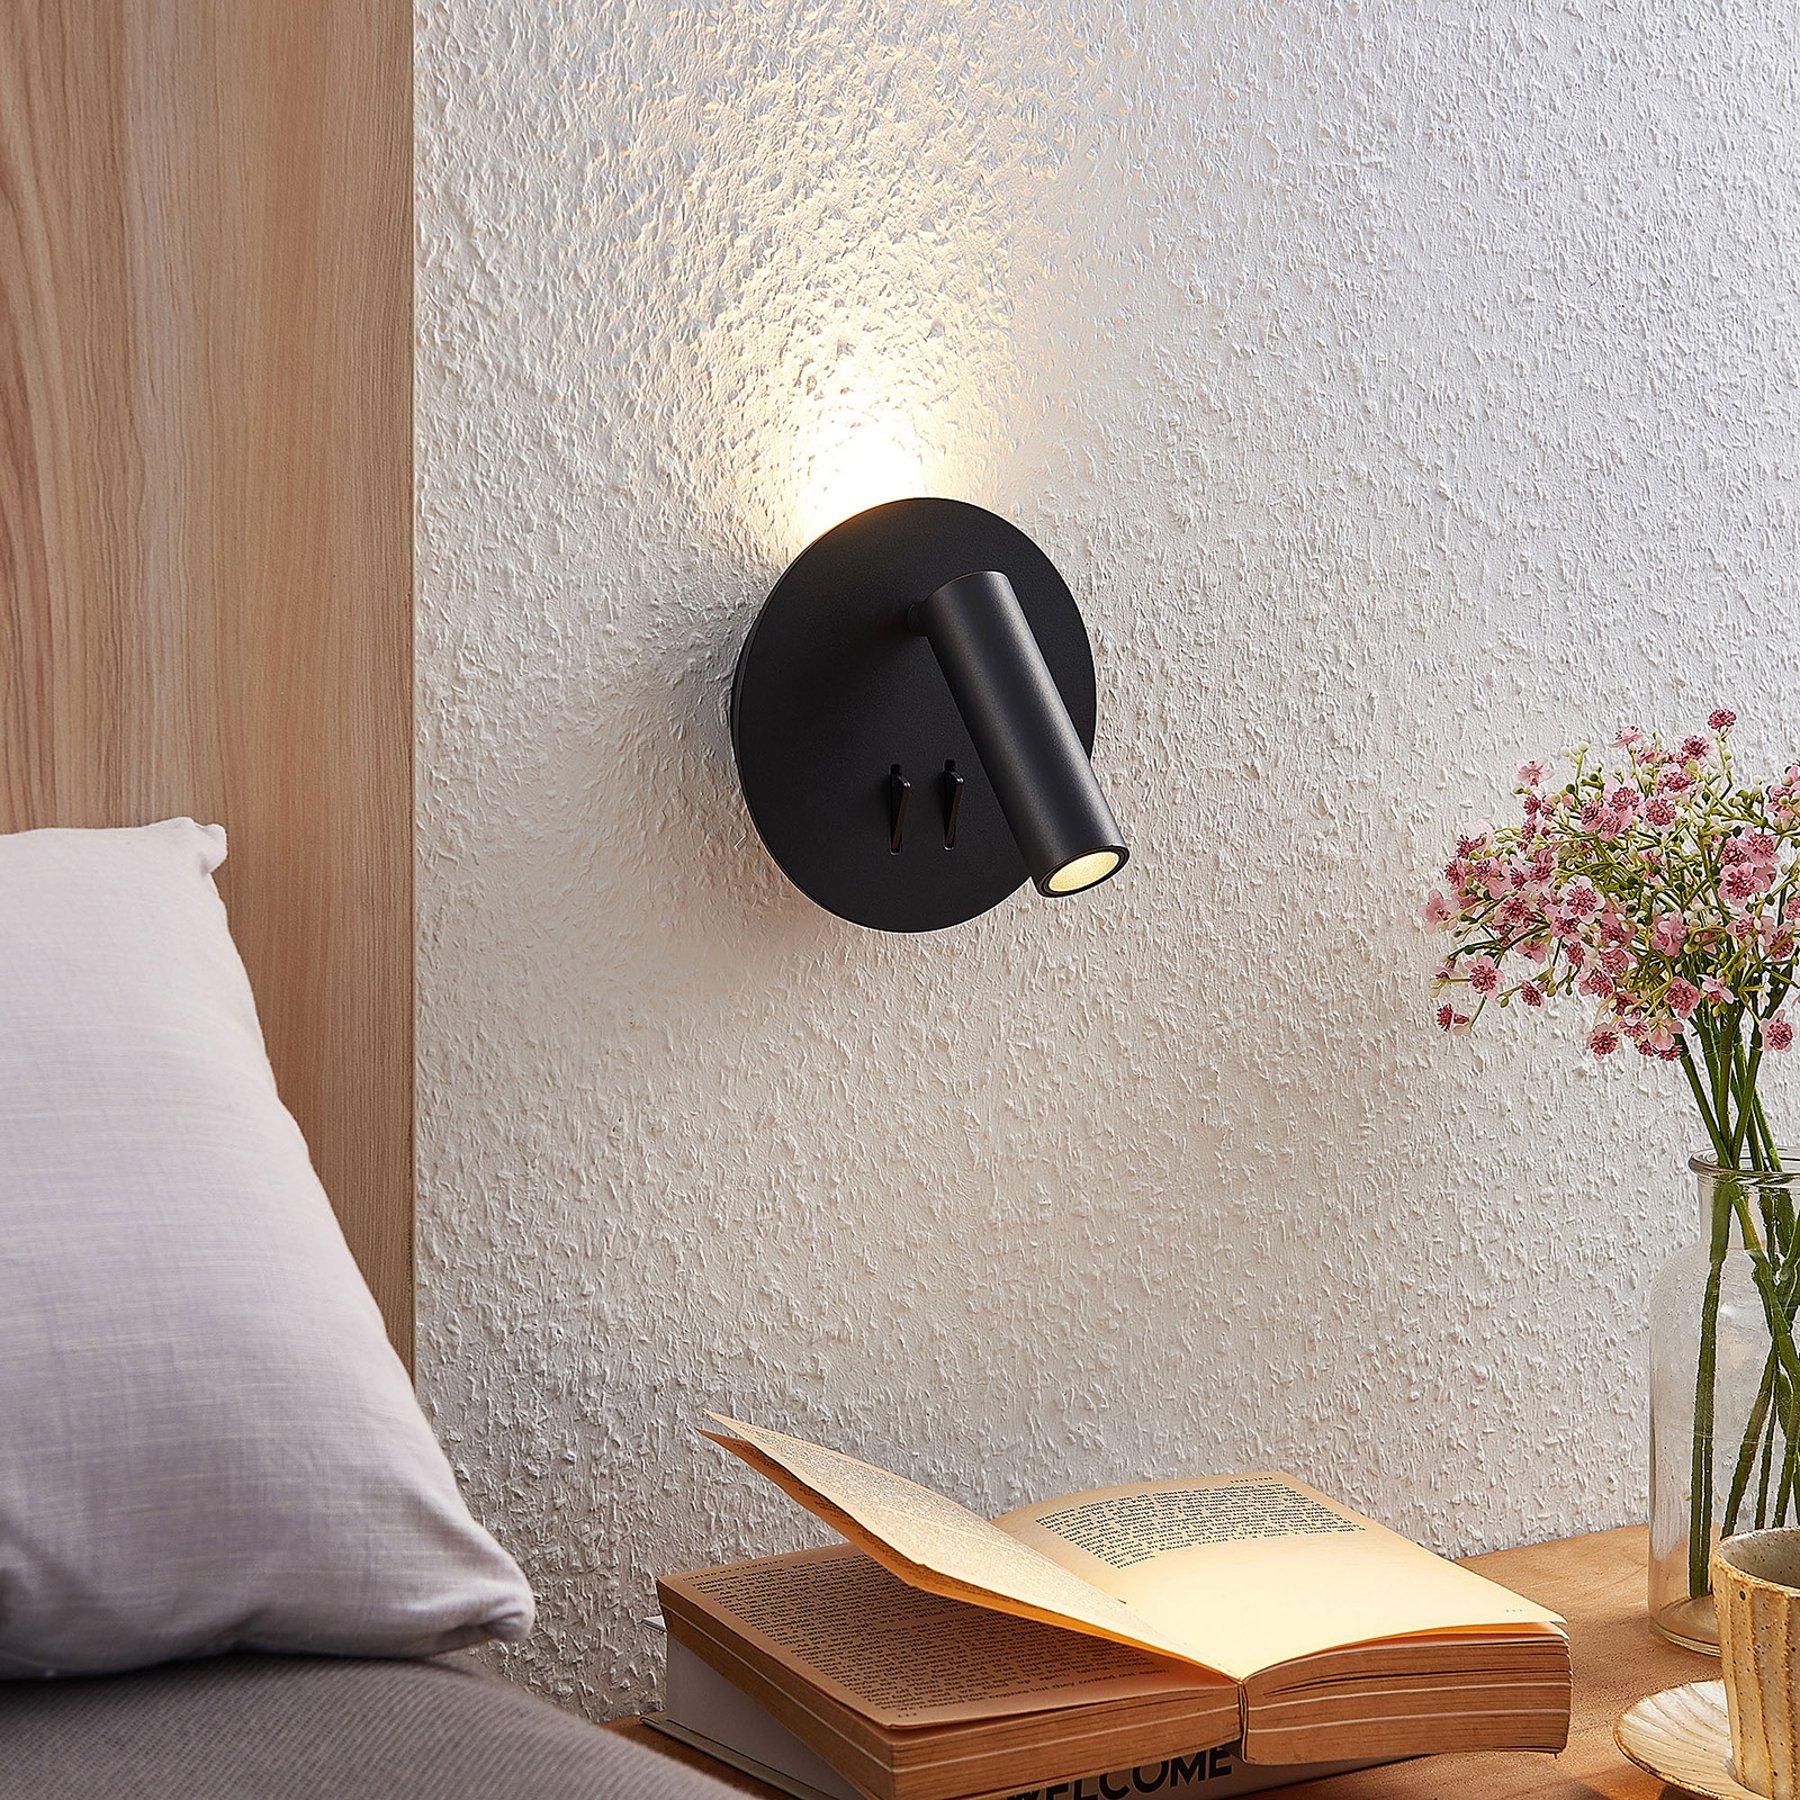 Lucande Magya LED-vegglampe svart 2 lyskilder rund